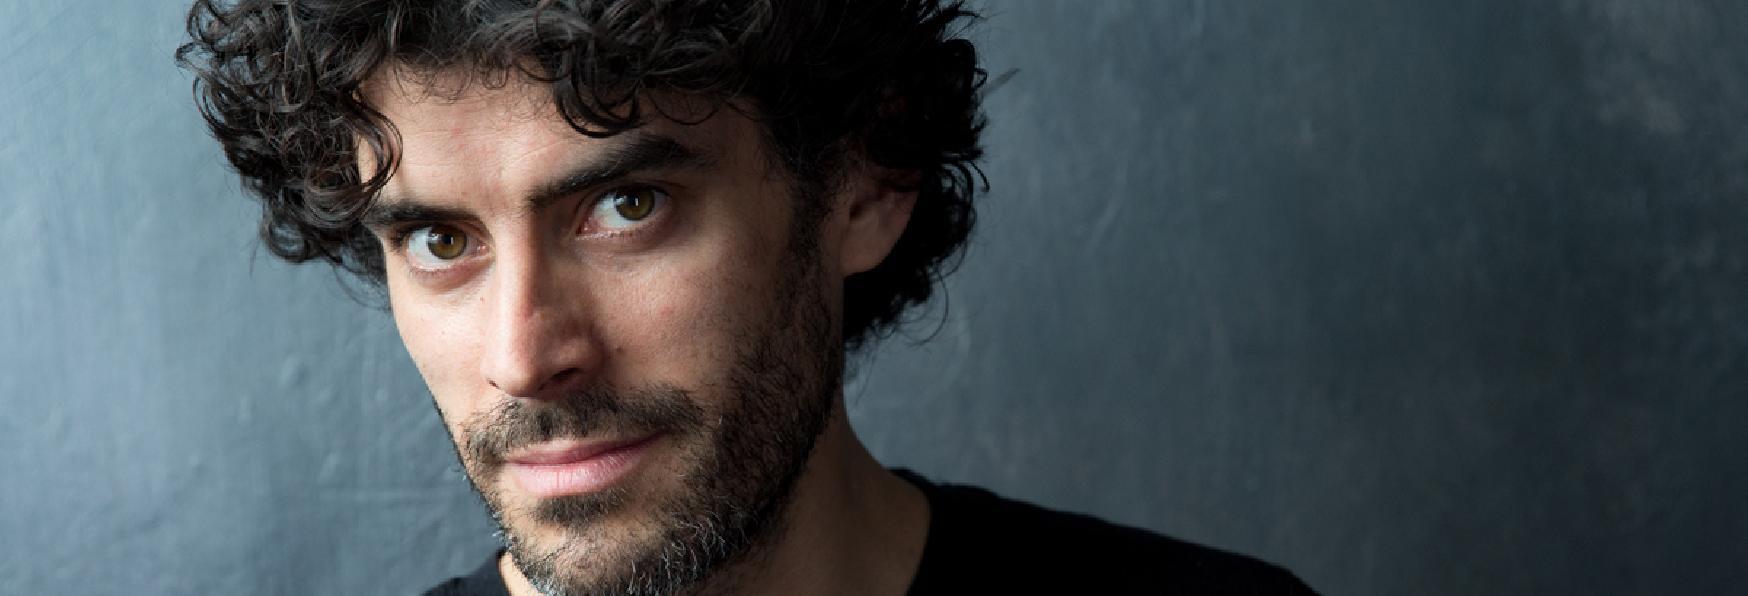 Game of Thrones: Toby Osmond propone uno Spin-off su Dorne